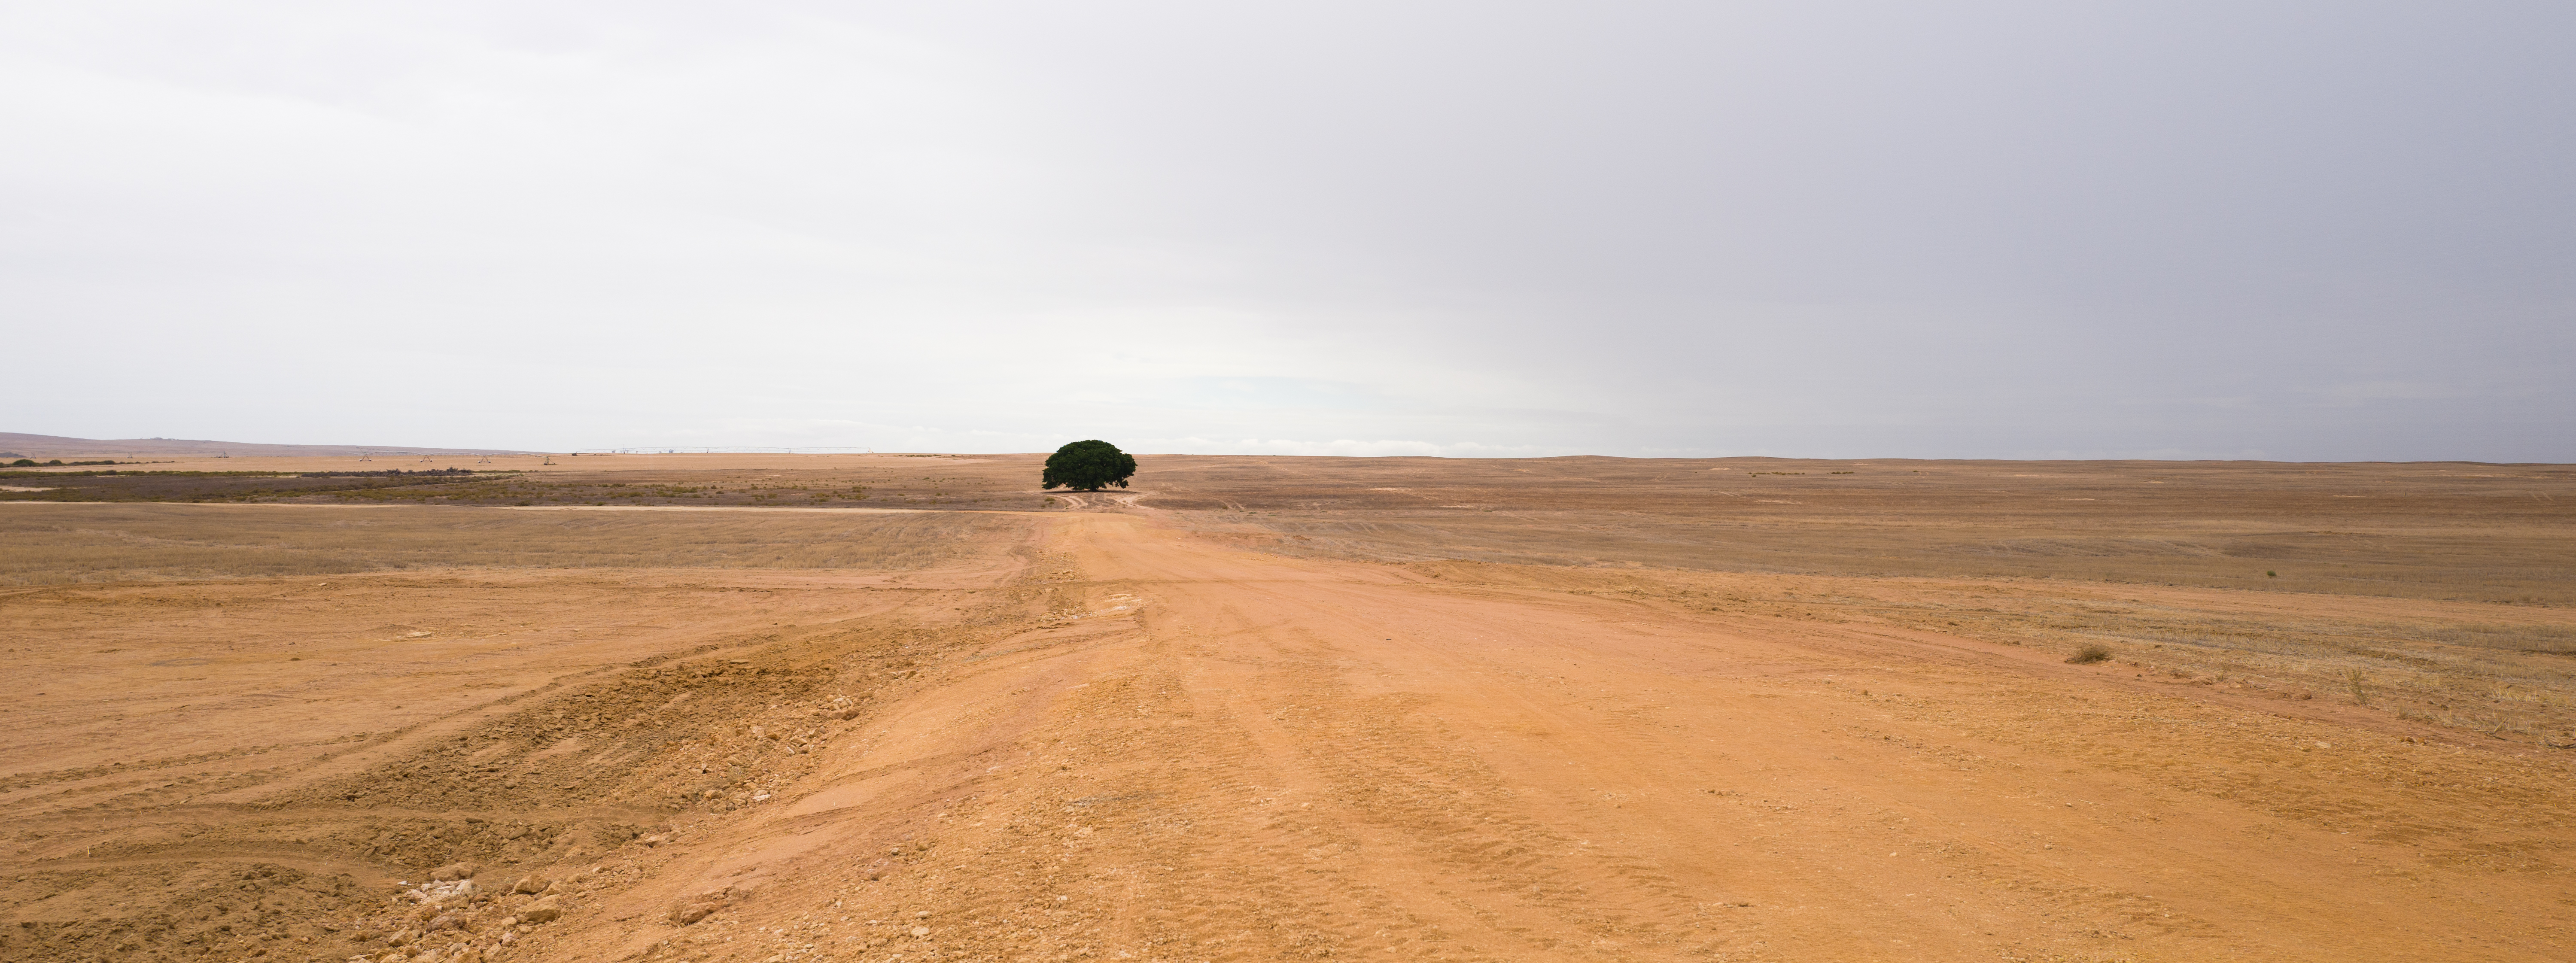 Auf dem Weg nach Bushmans Kloof, ZA -100